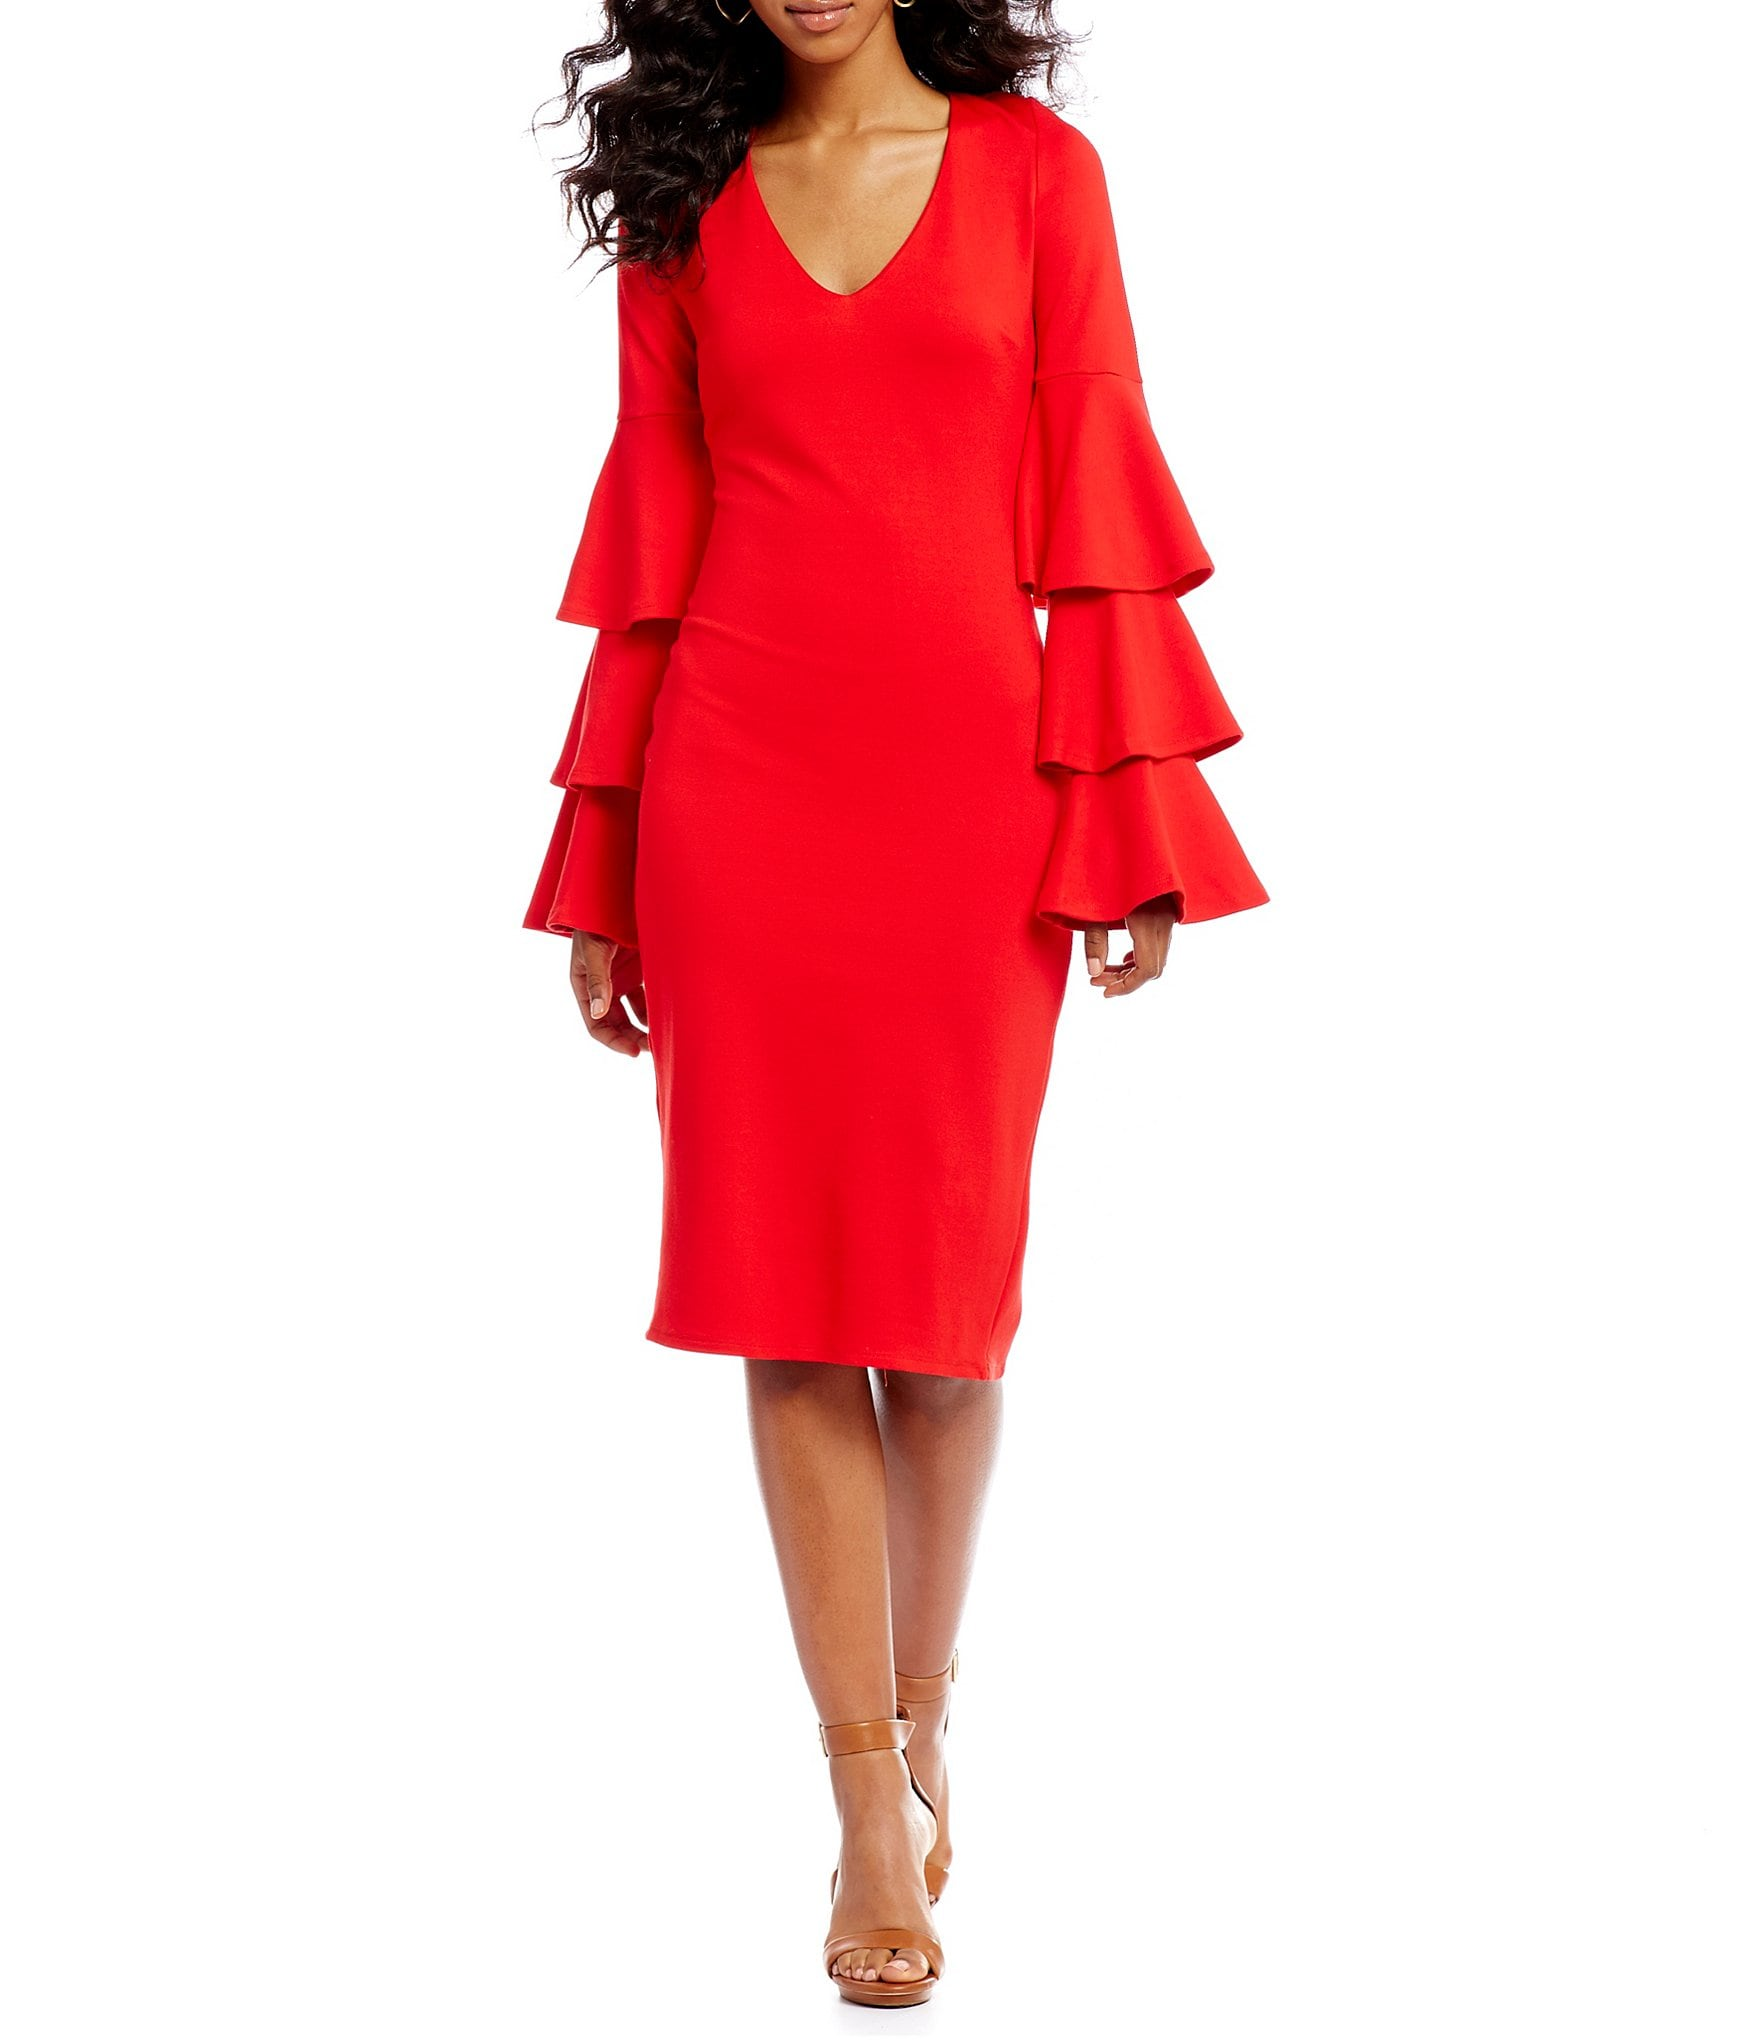 Women\'s Daytime & Casual Dresses   Dillards